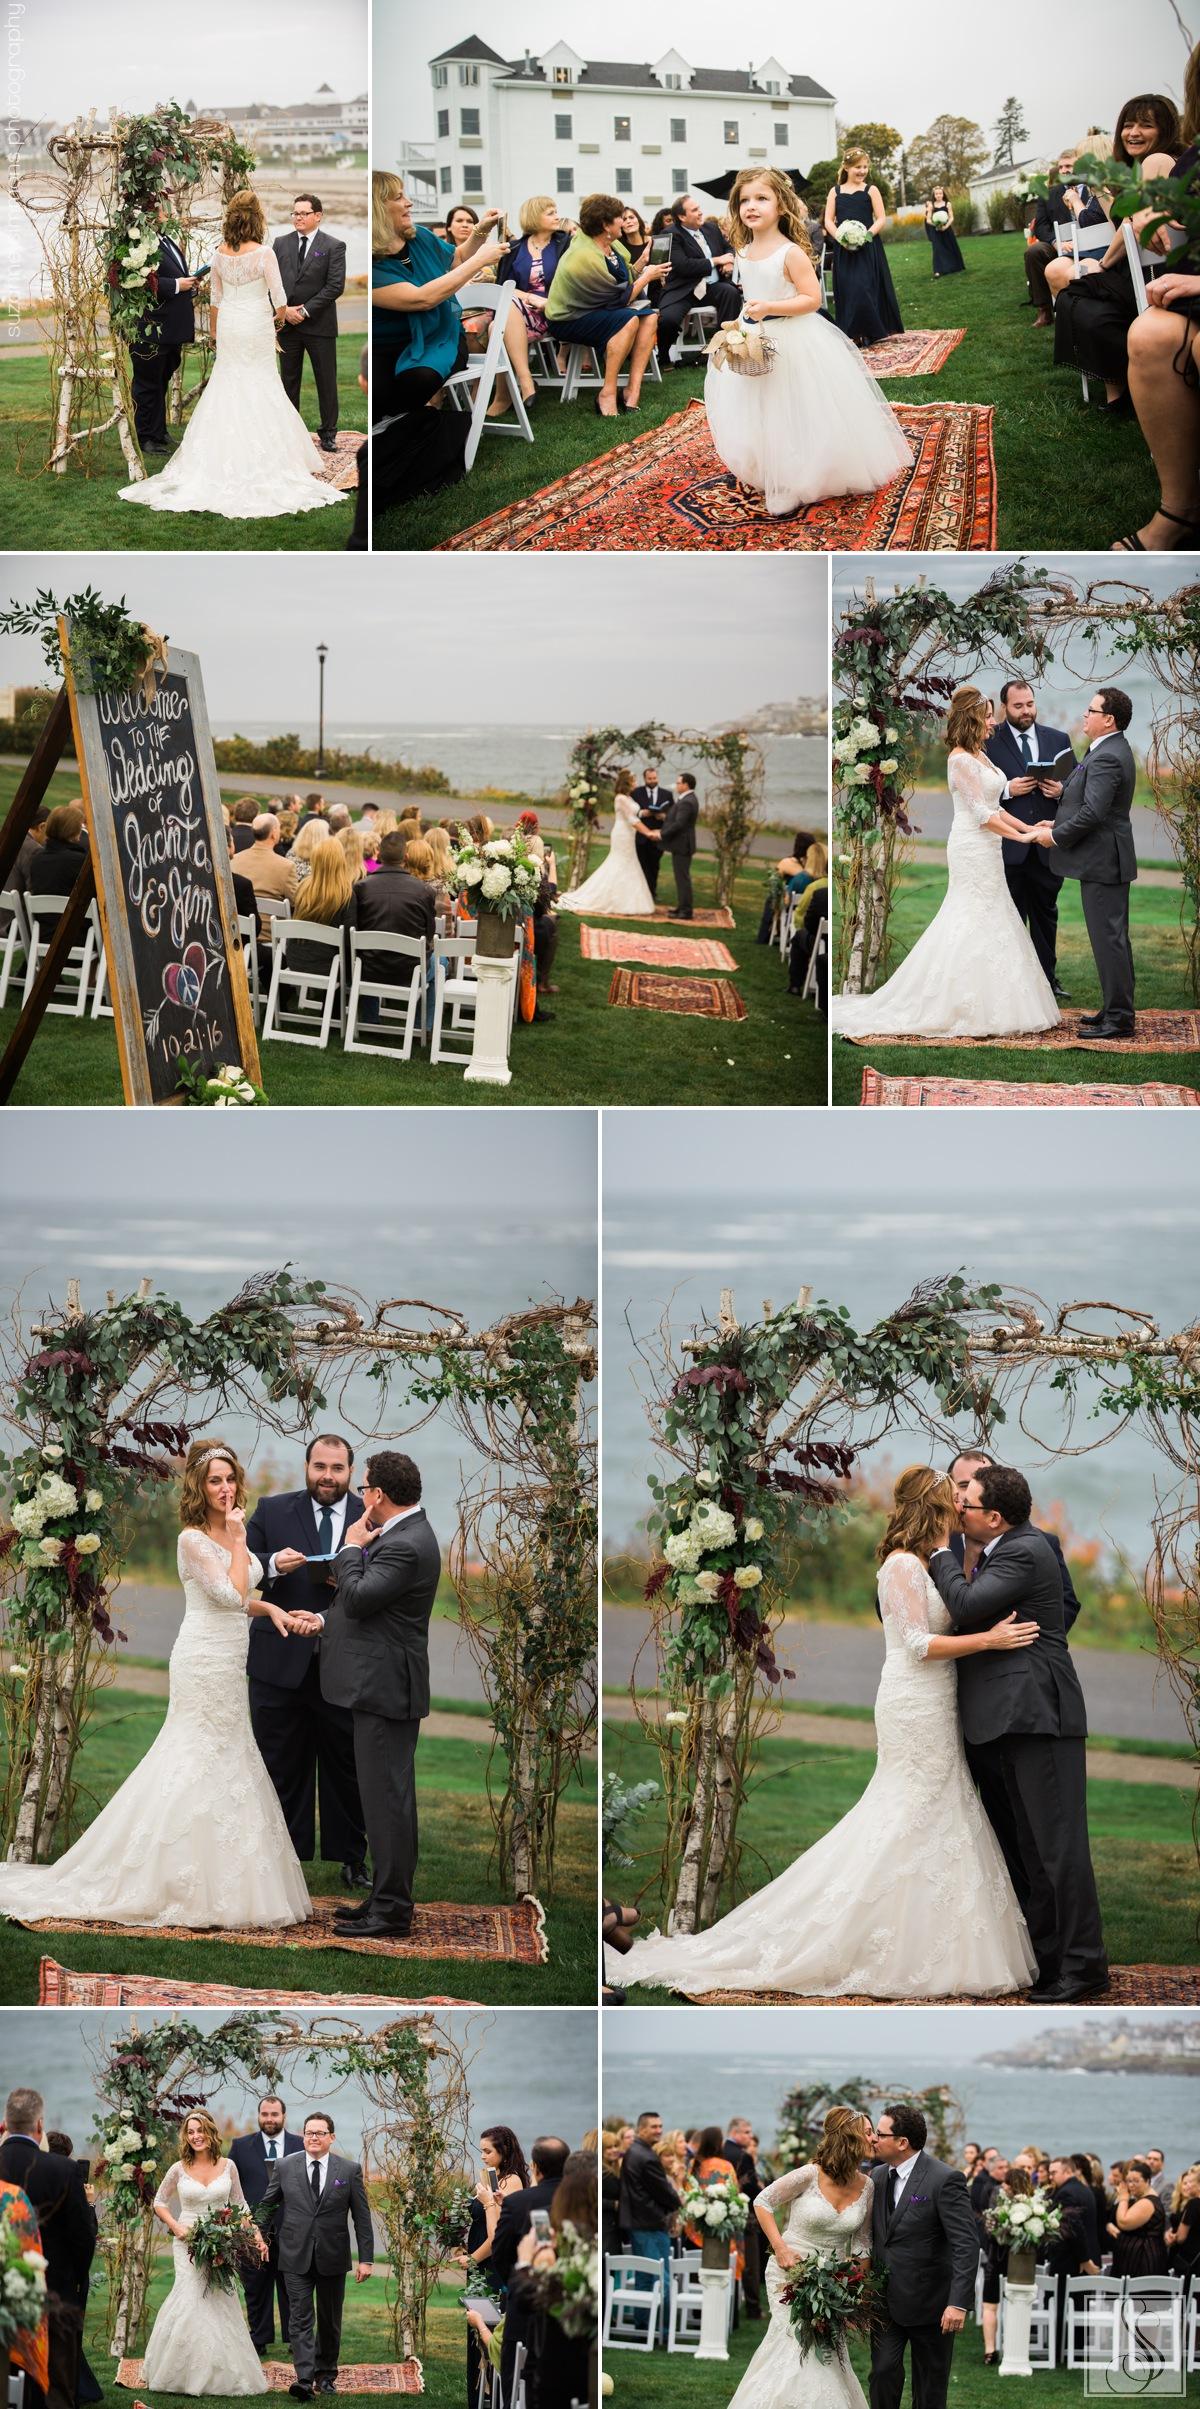 Rainy day wedding in York, Maine